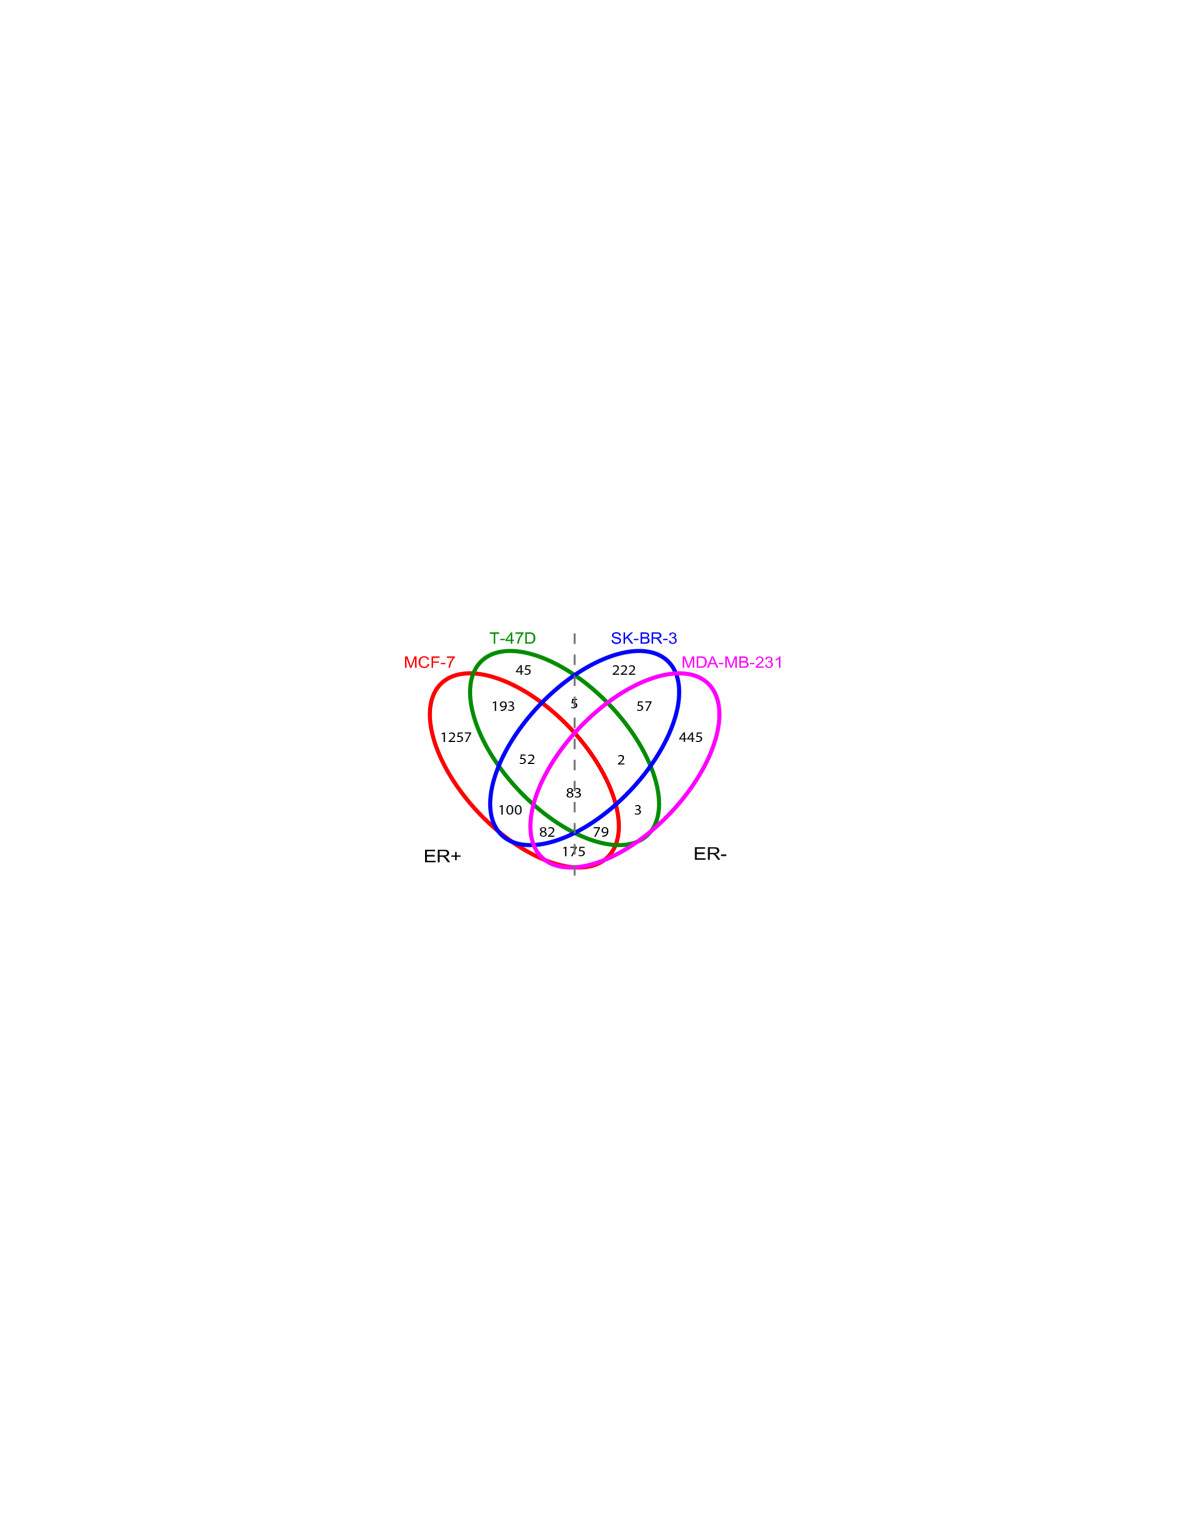 https://static-content.springer.com/image/art%3A10.1186%2Fbcr3443/MediaObjects/13058_2013_3271_Fig1_HTML.jpg